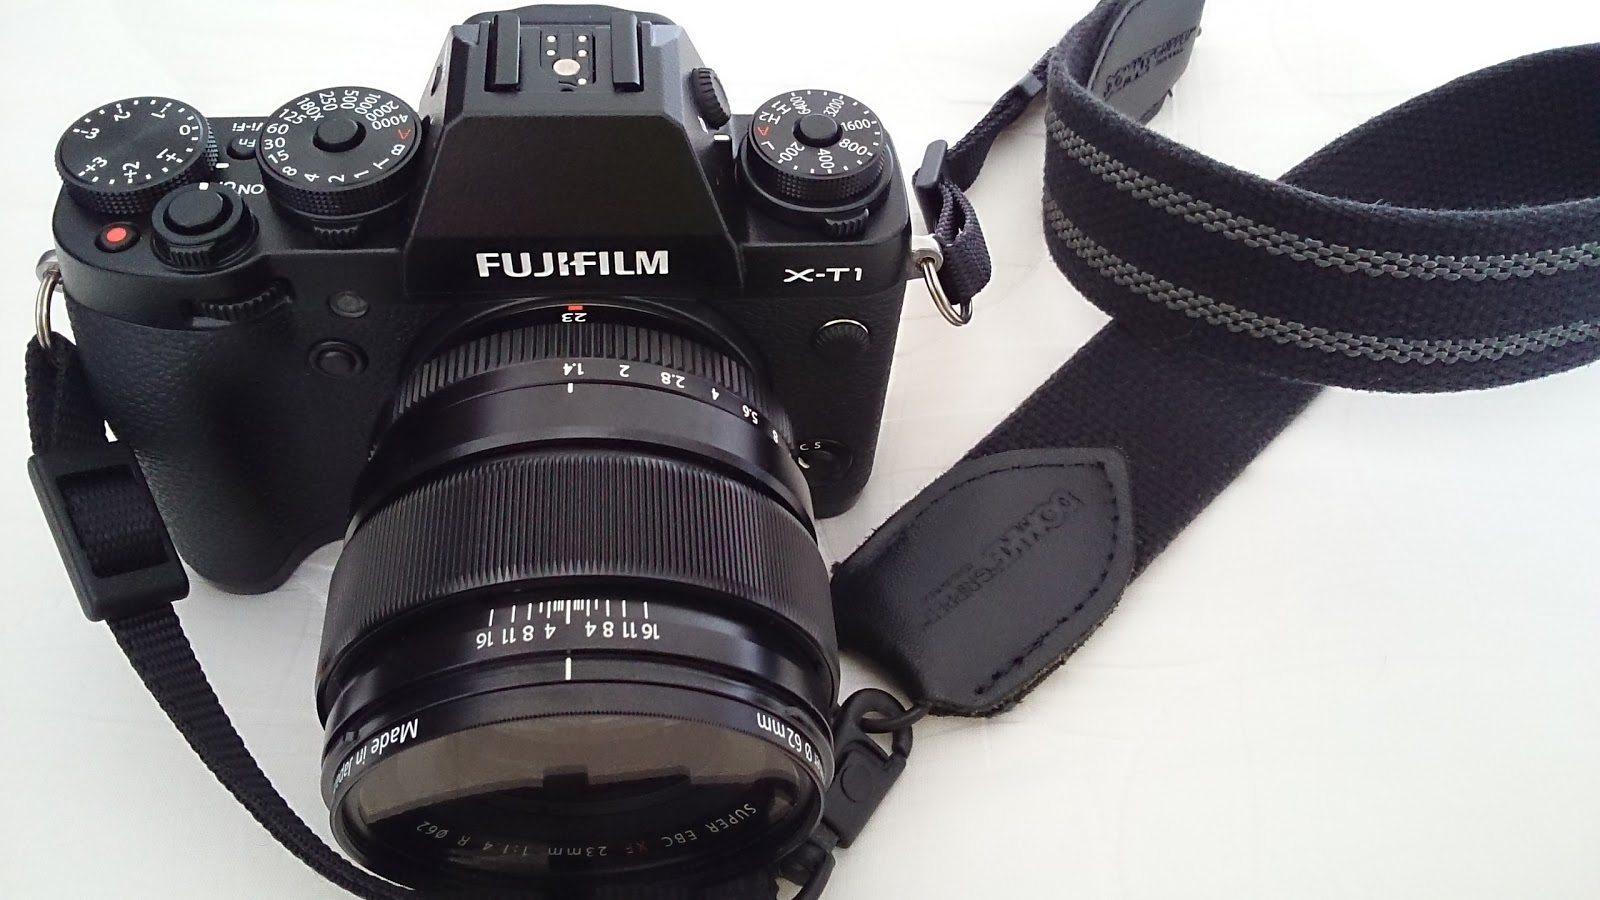 Fujifilm xt1 top 2